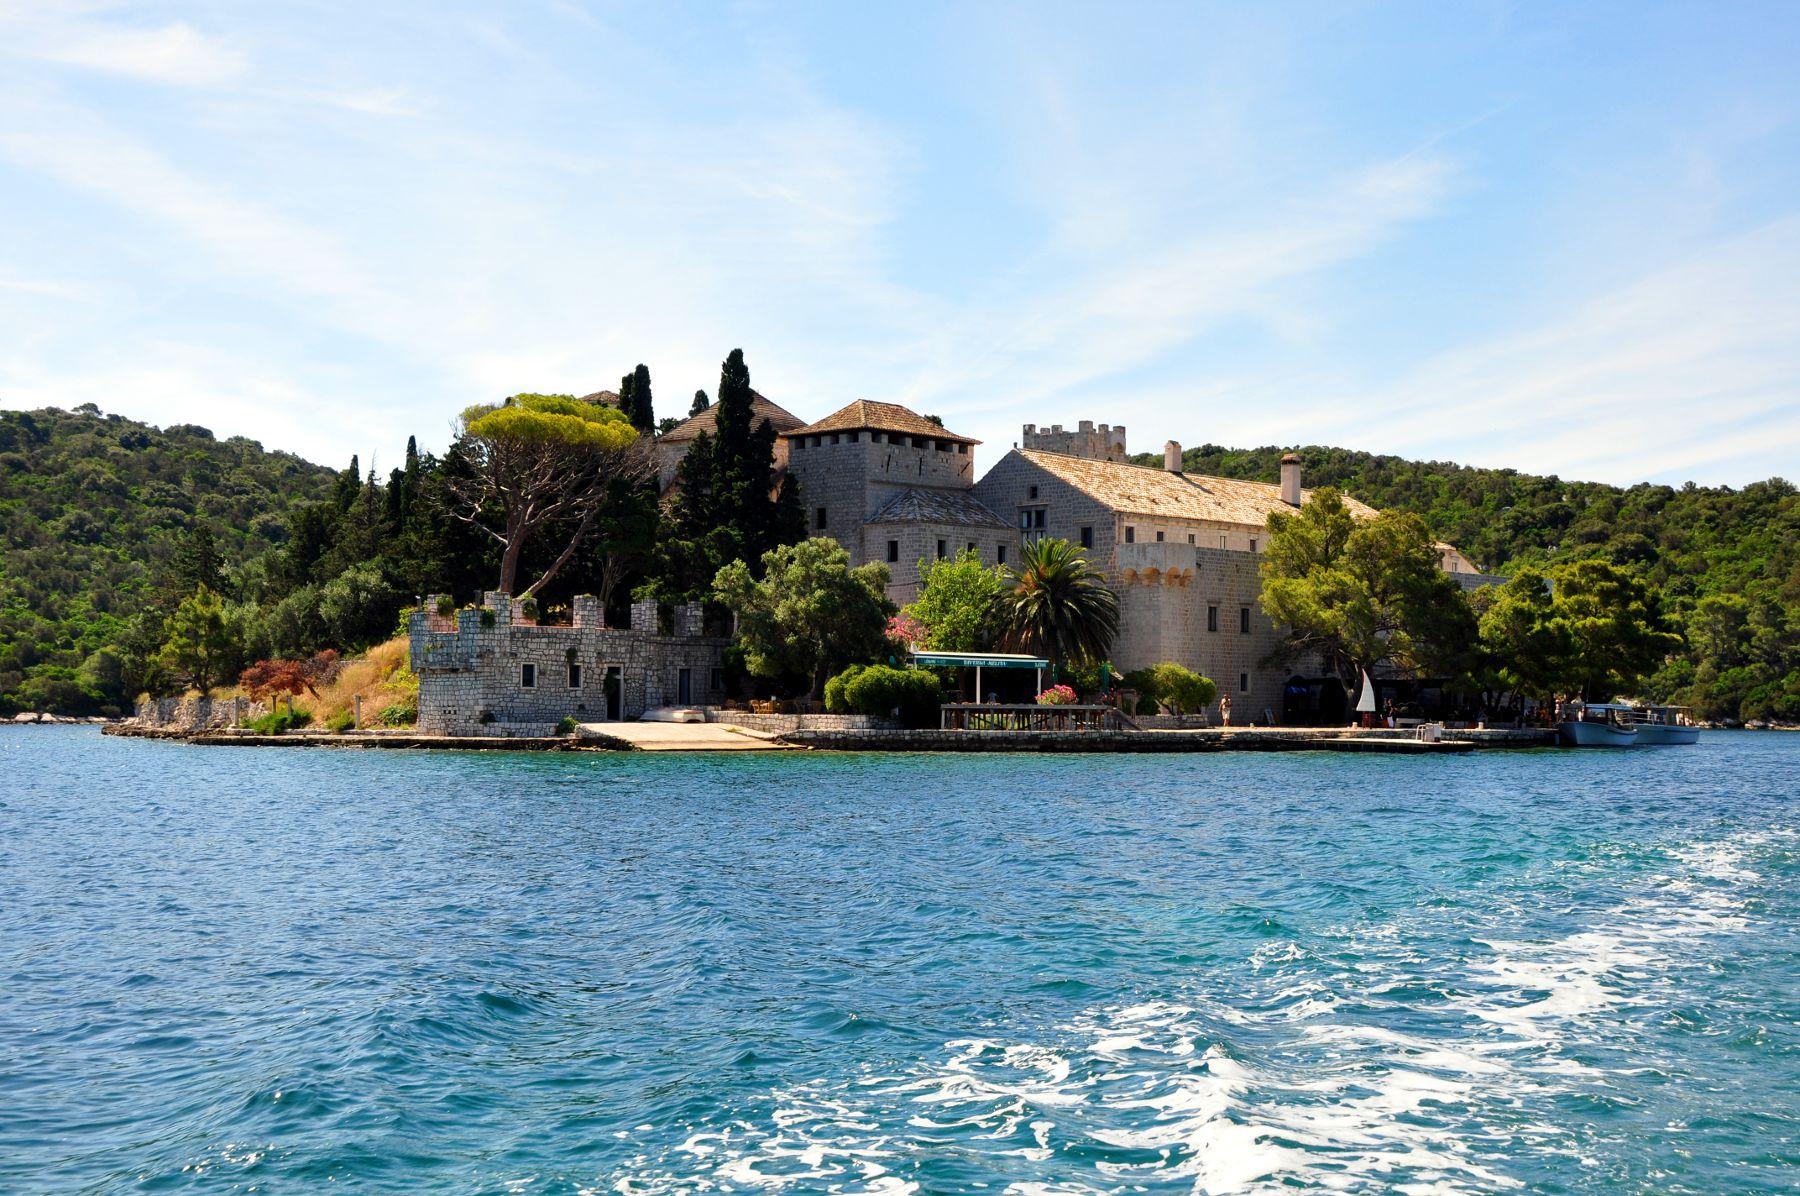 Dubrovnik i južna Dalmacija: Nacionalni park Mljet